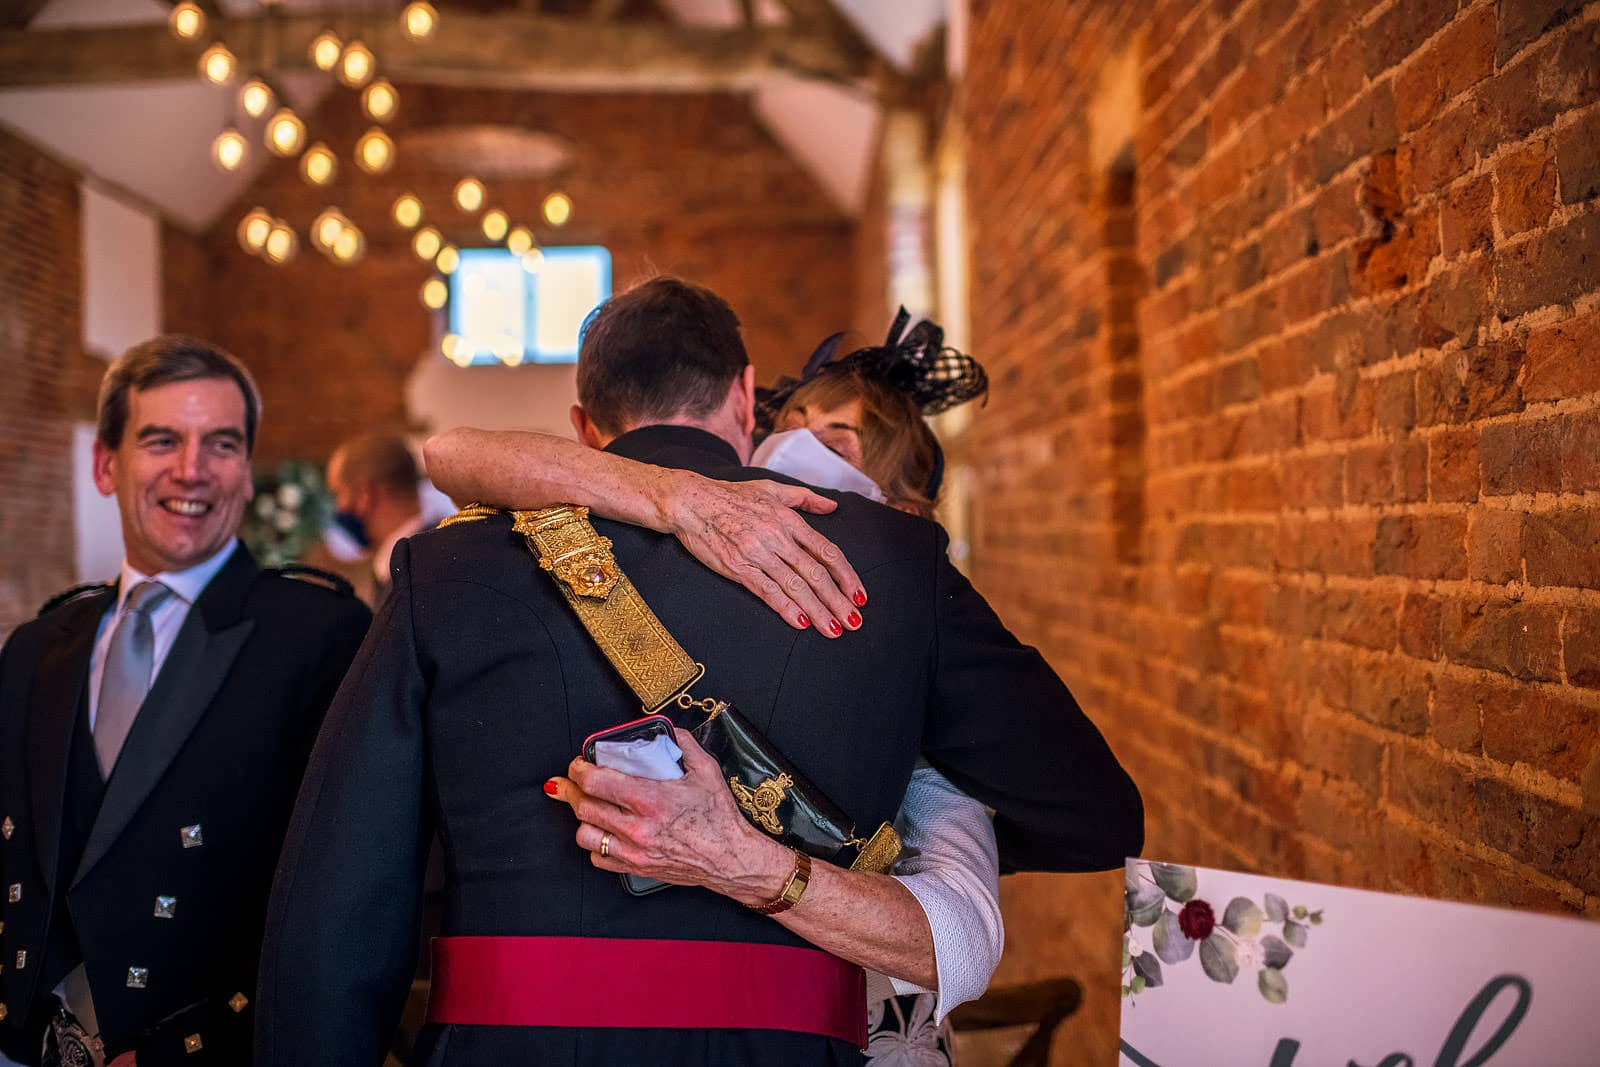 Guest giving groom a hug